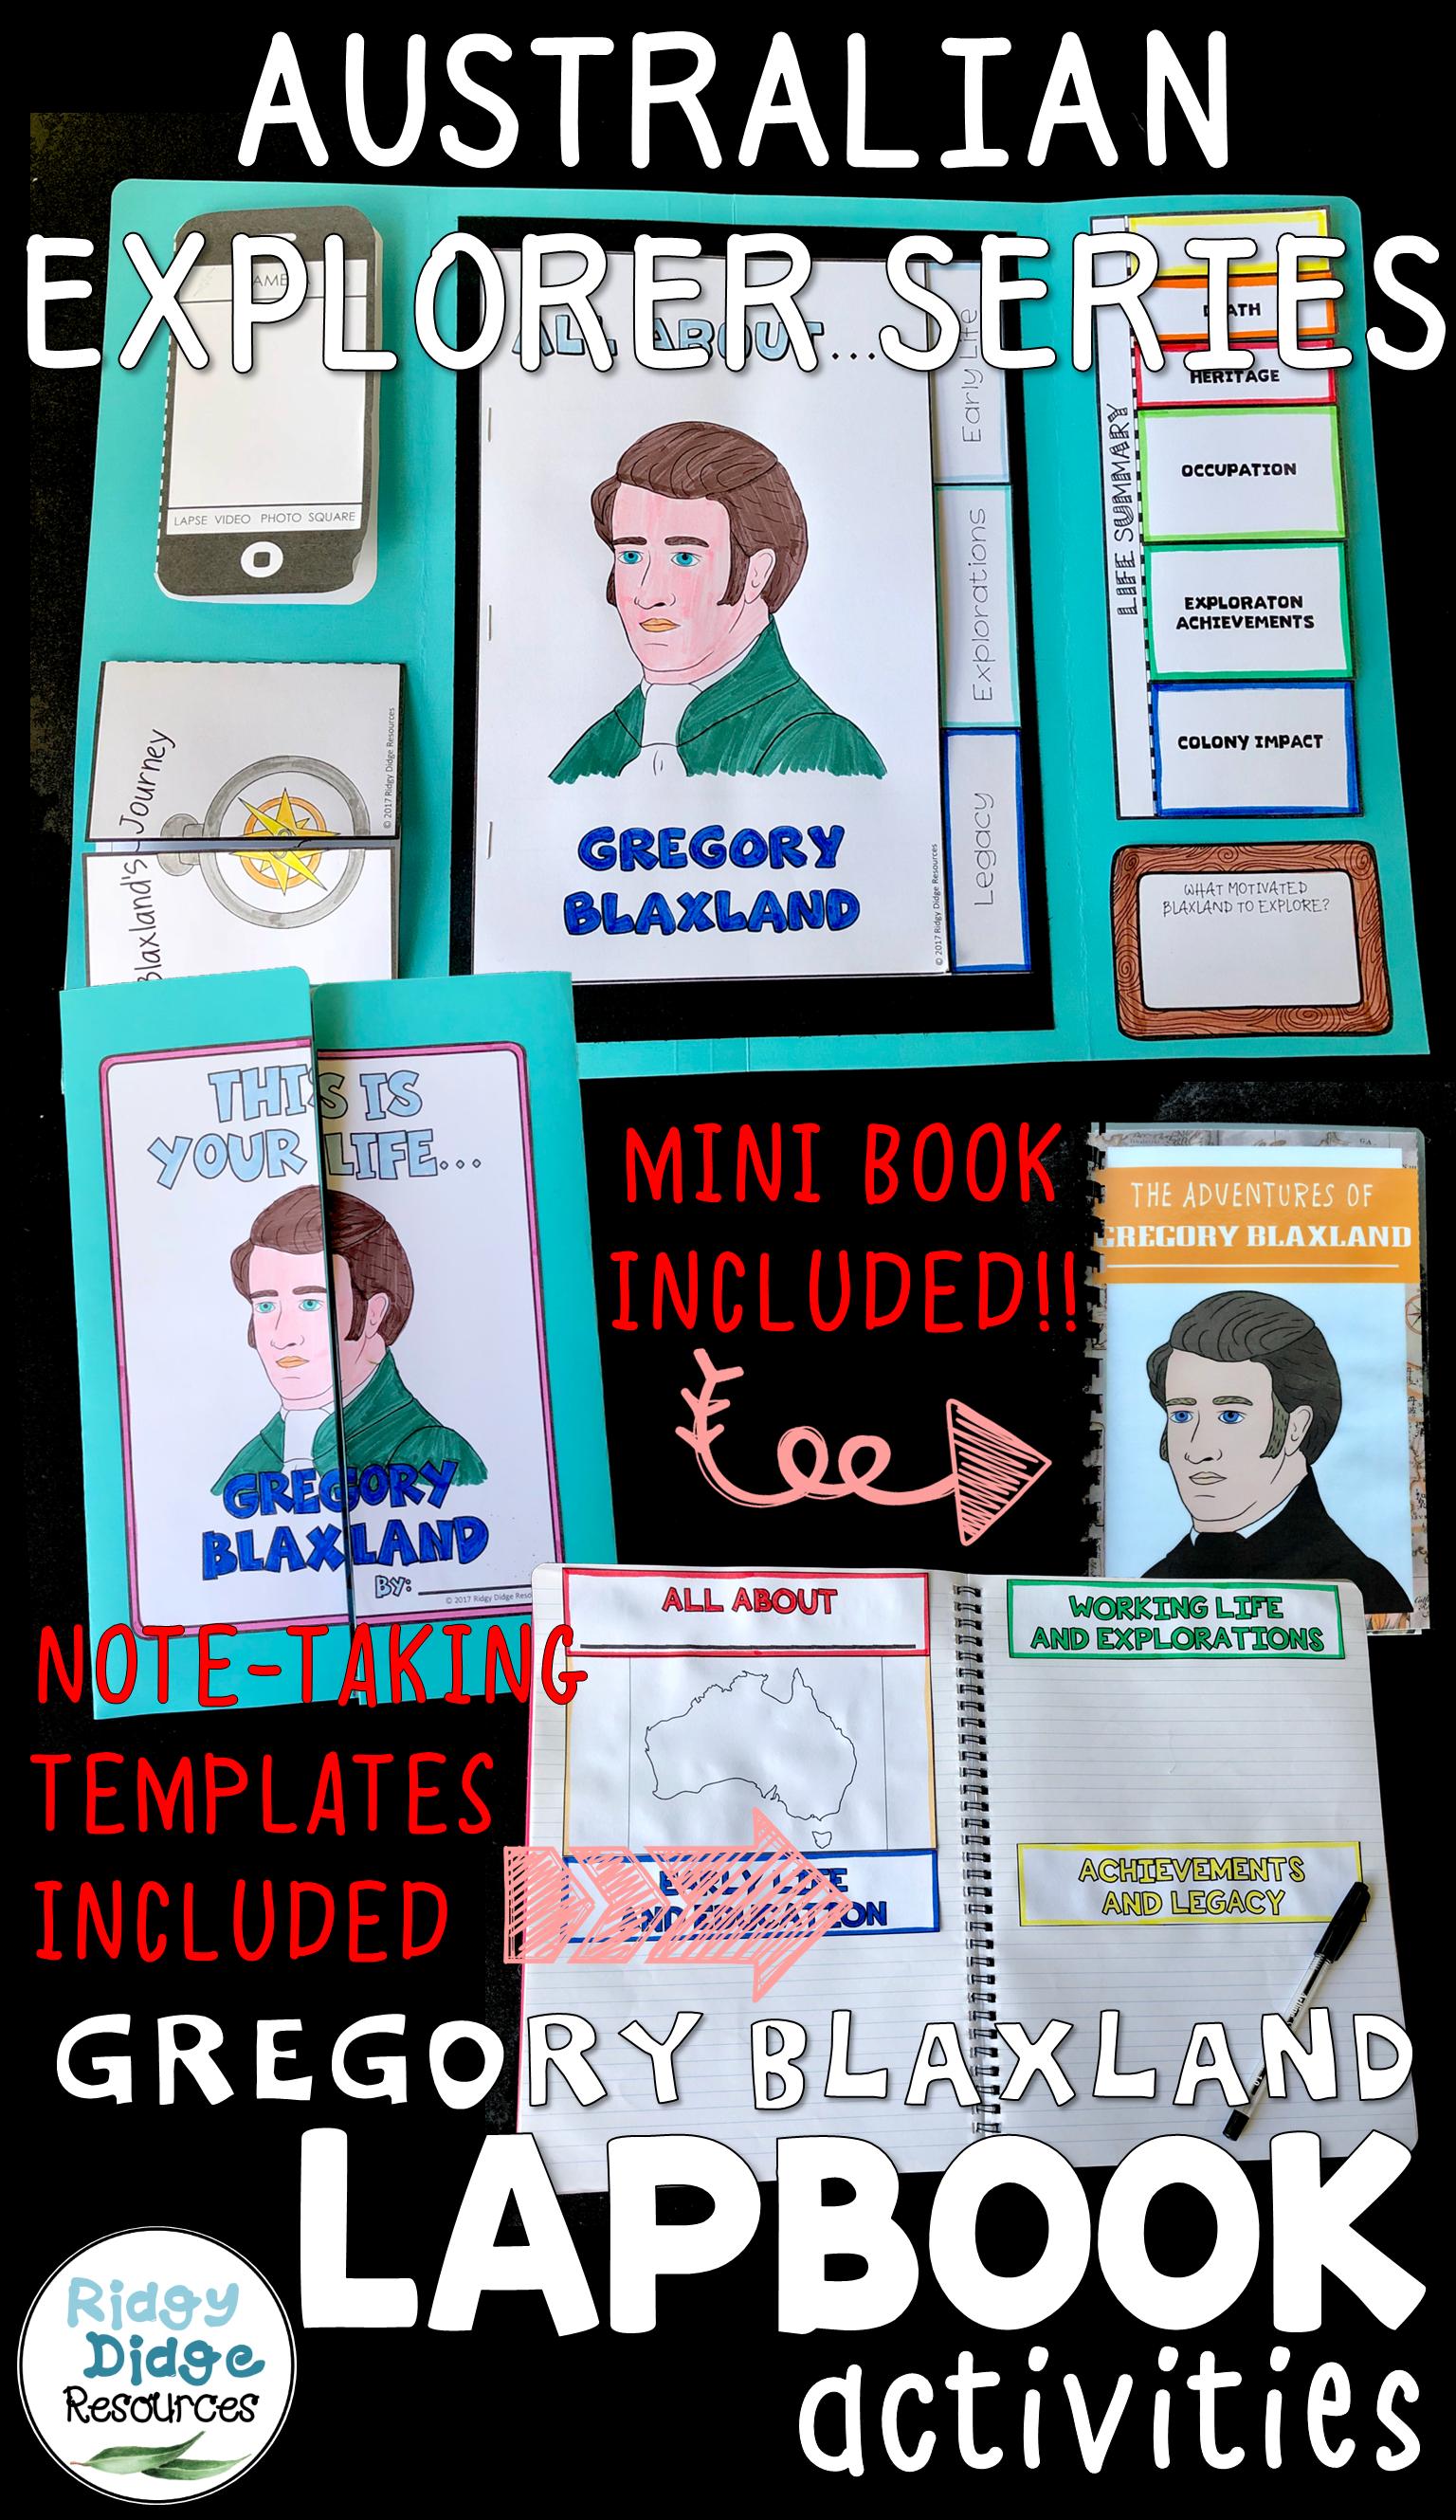 Gregory Blaxland Australian Explorers Lapbook Series (With